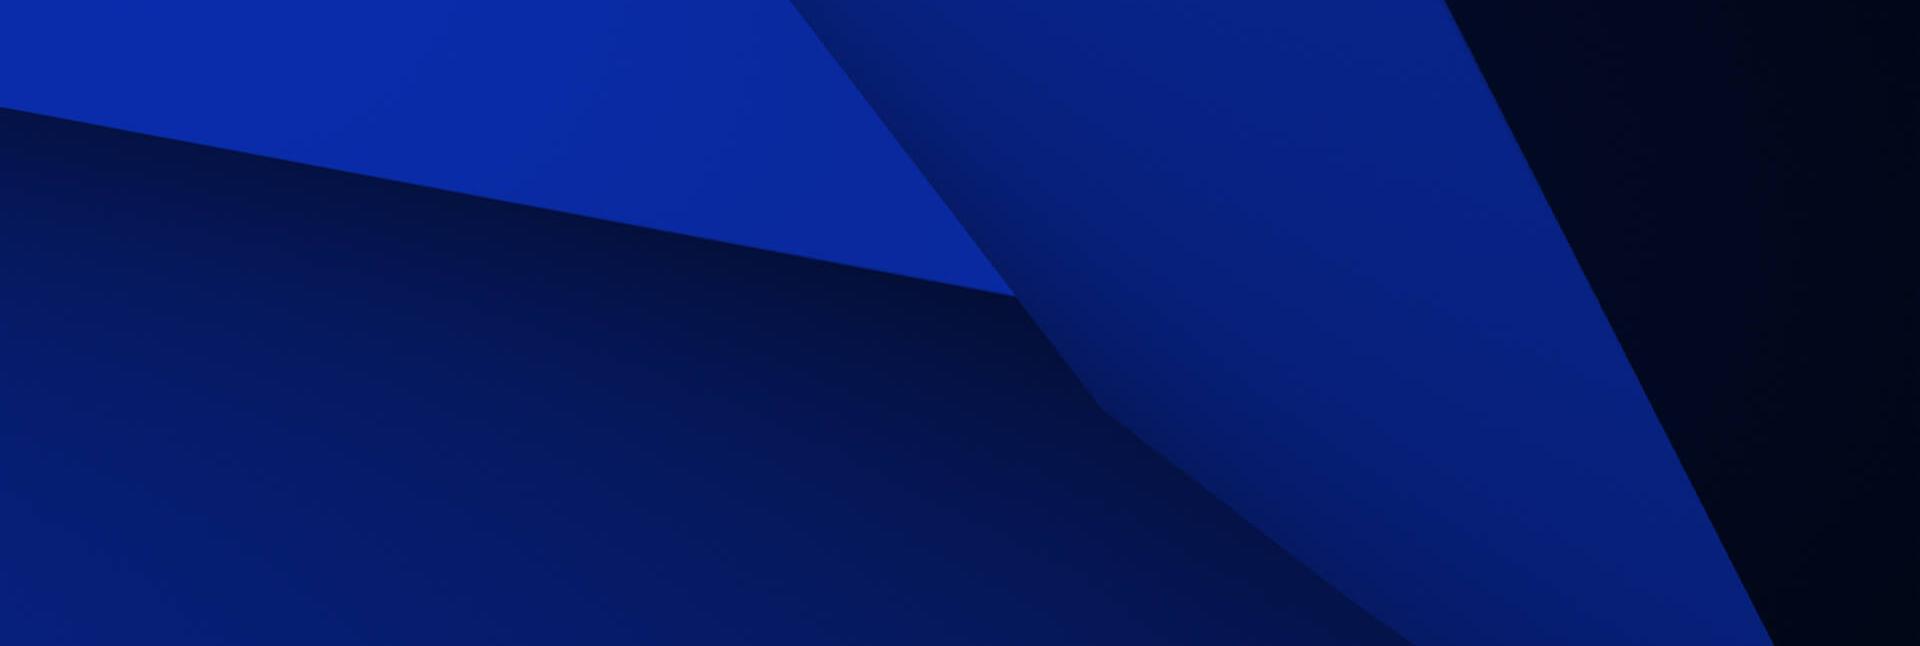 rra-background-blue-15-2021.jpg